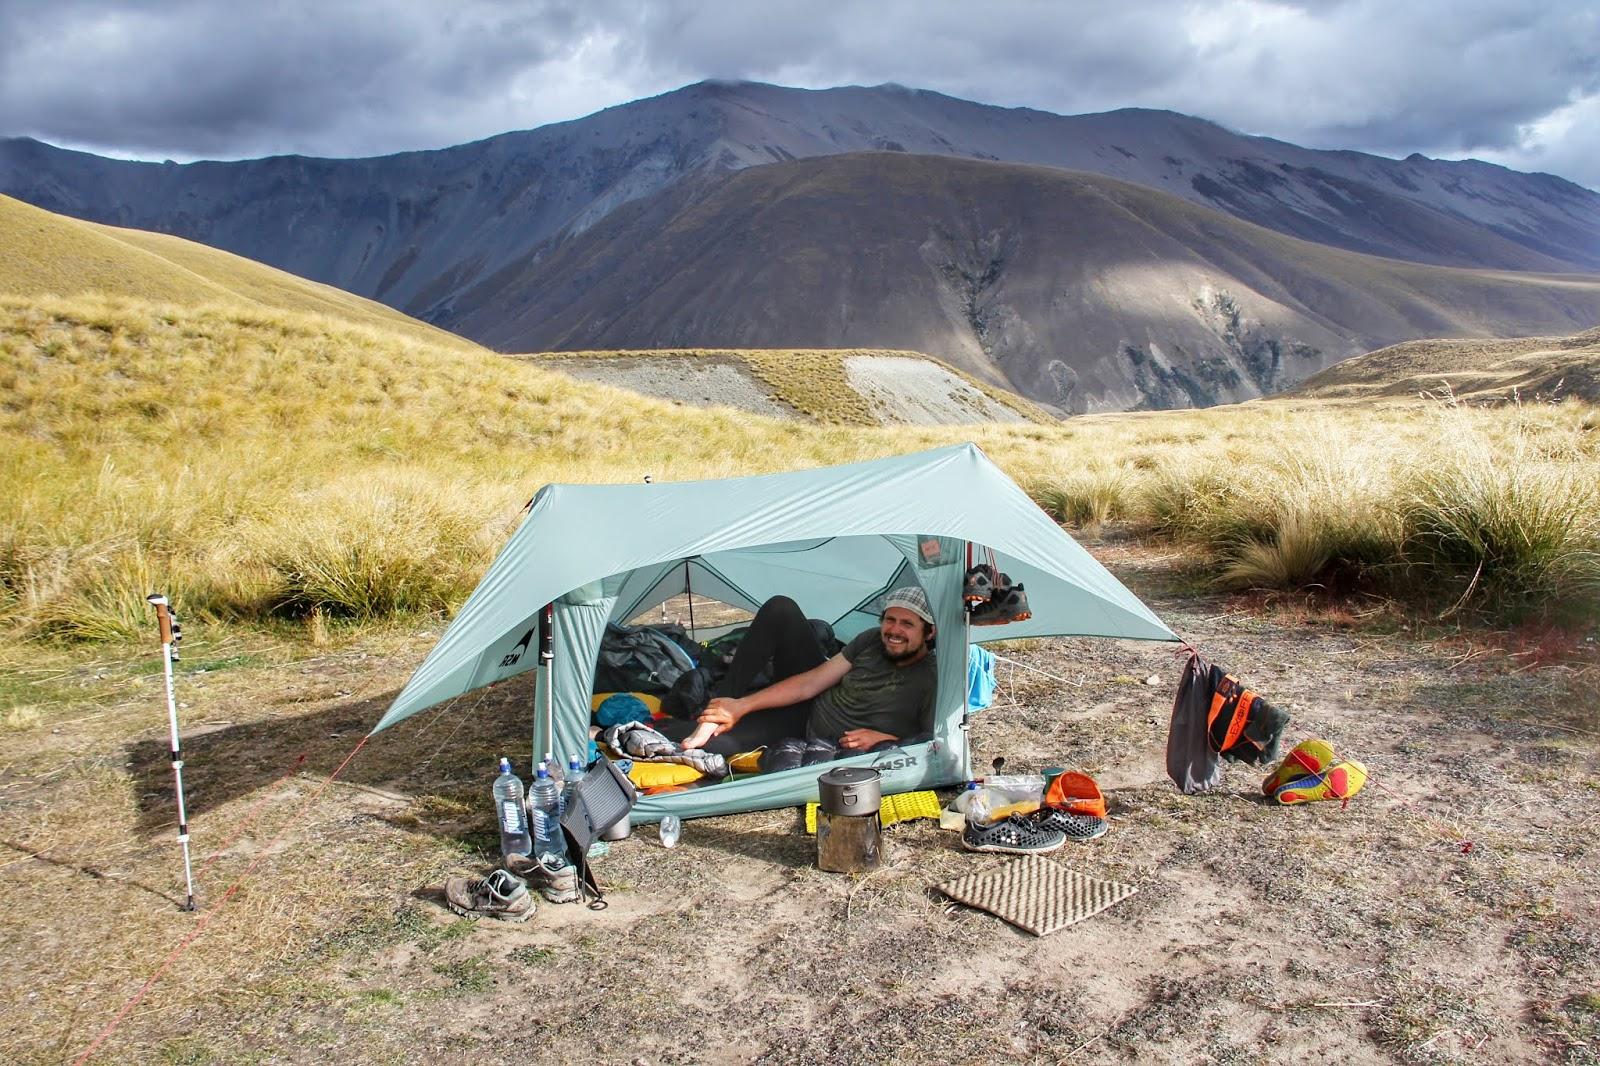 Outdoorküche Camping Ground : Outdoorküche camping ground details zu camping hakenleiste